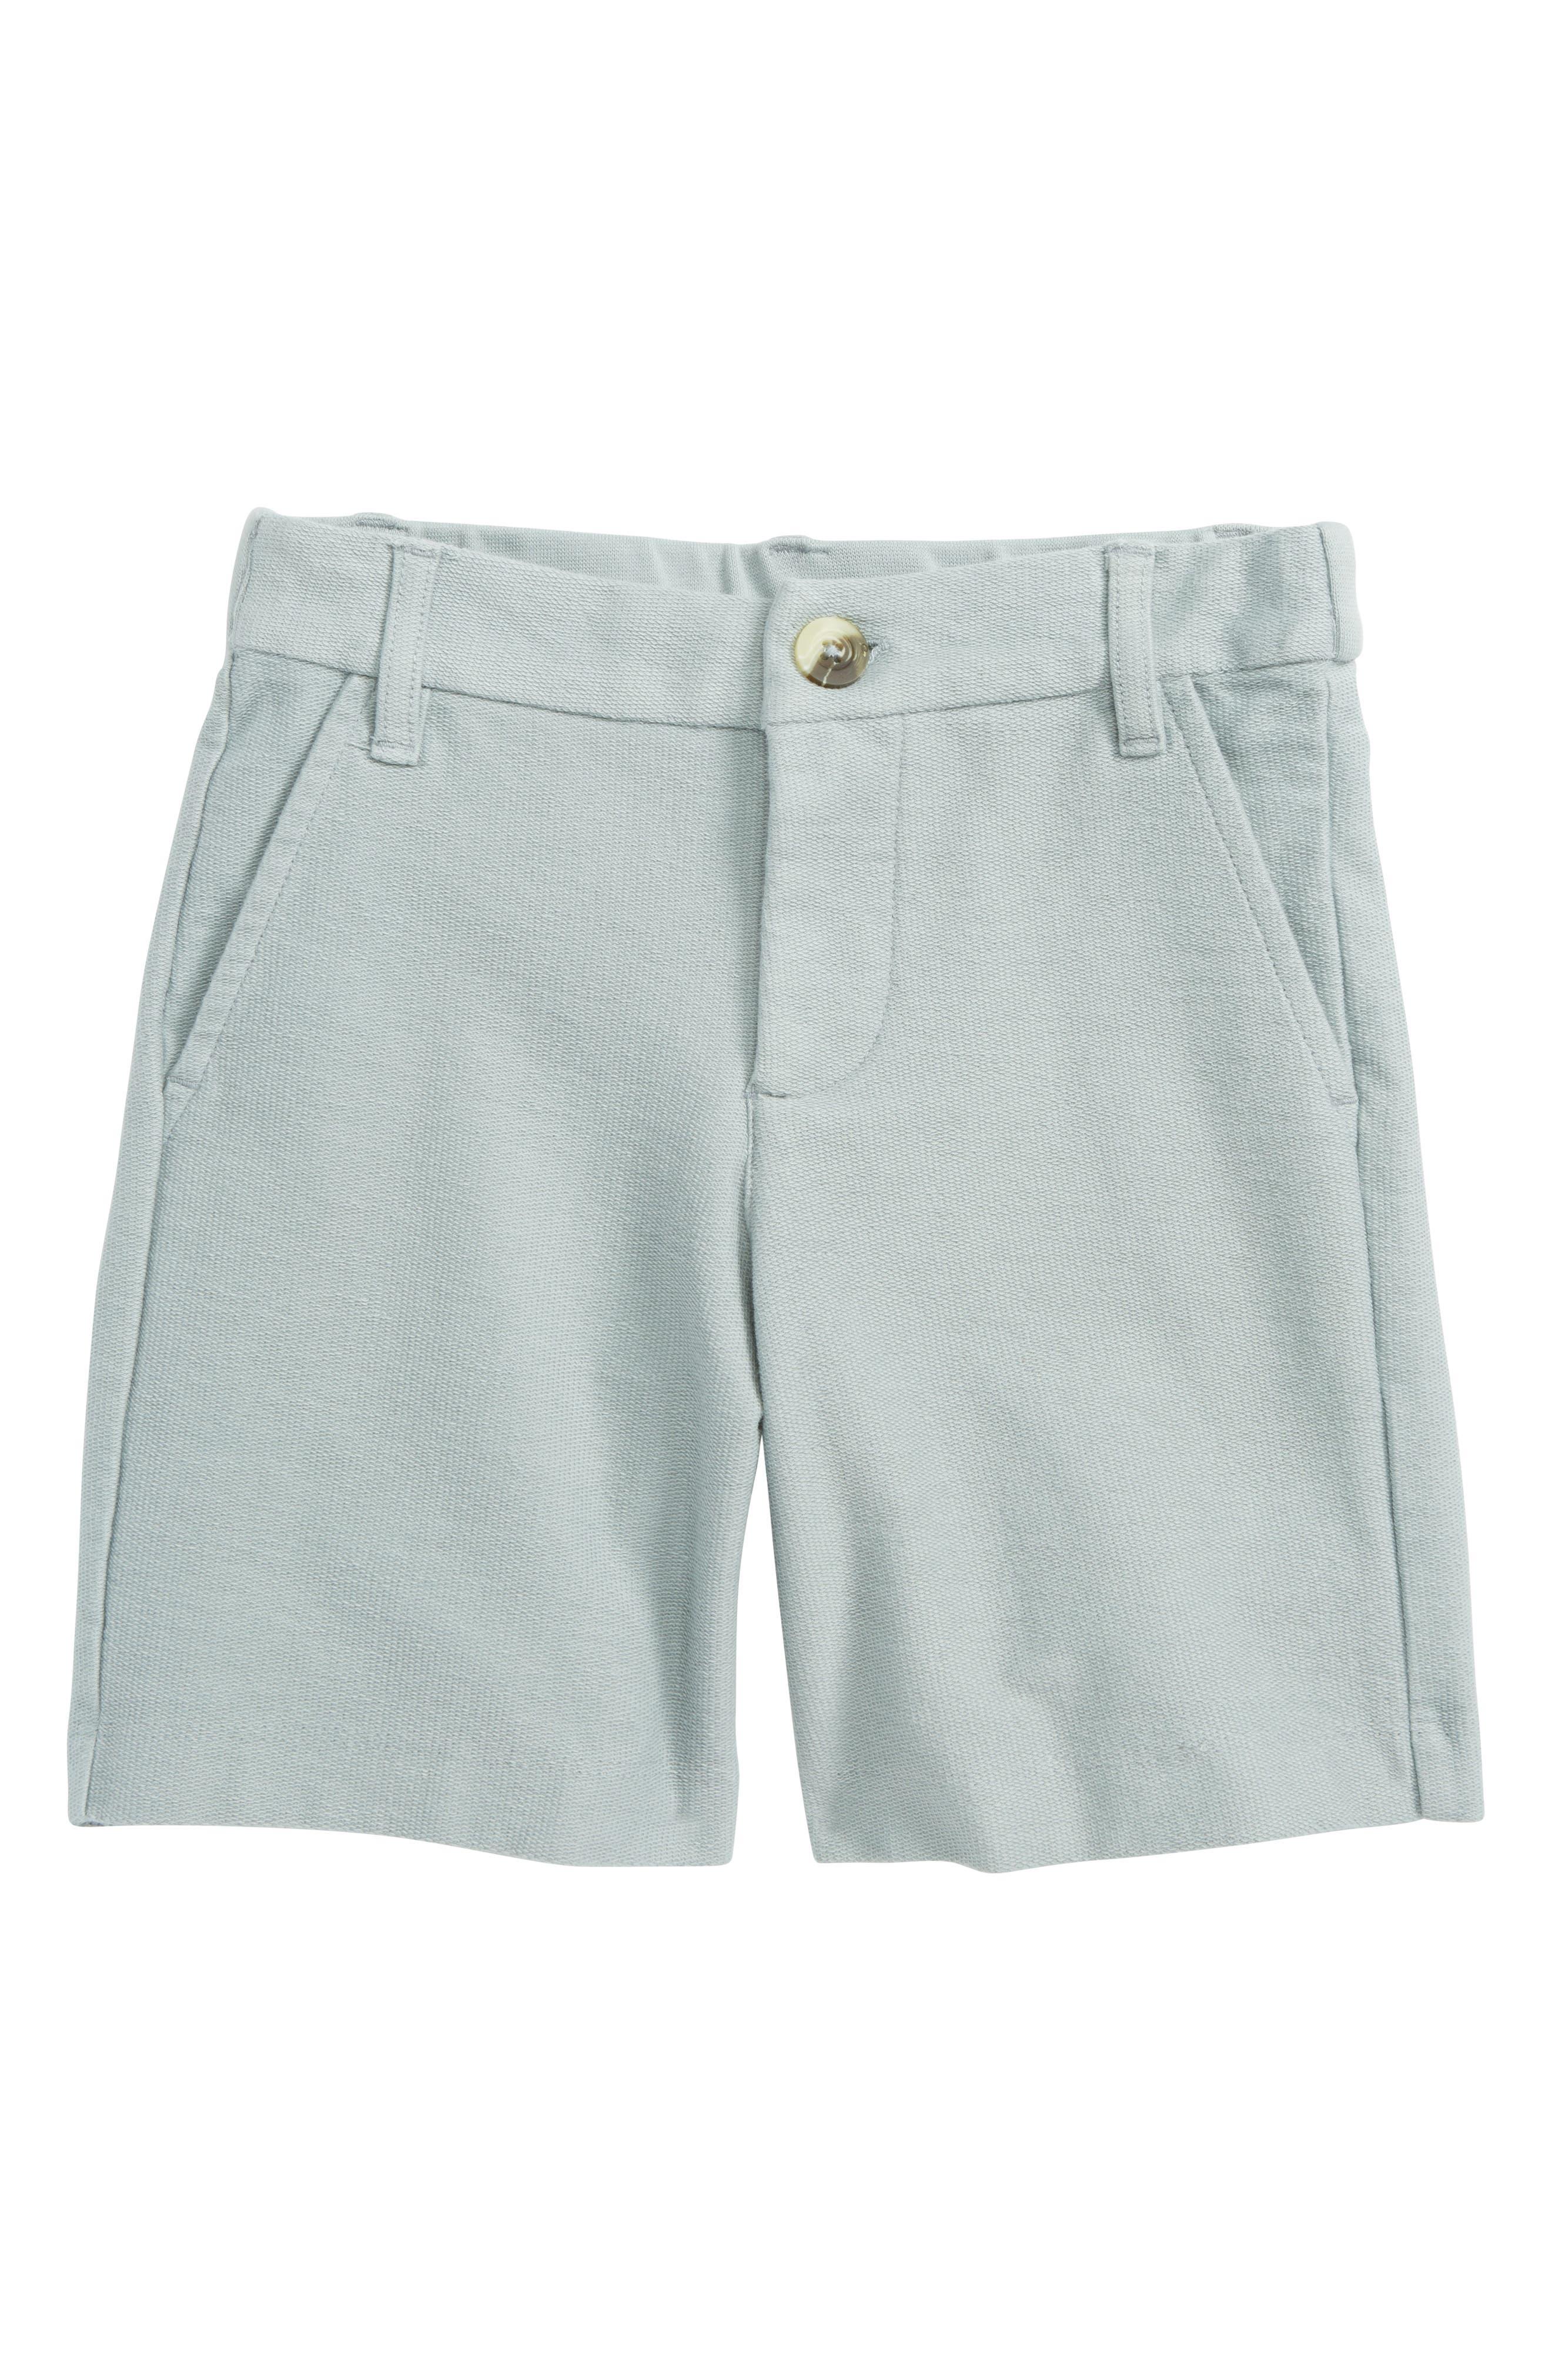 Easton Shorts,                         Main,                         color, 322